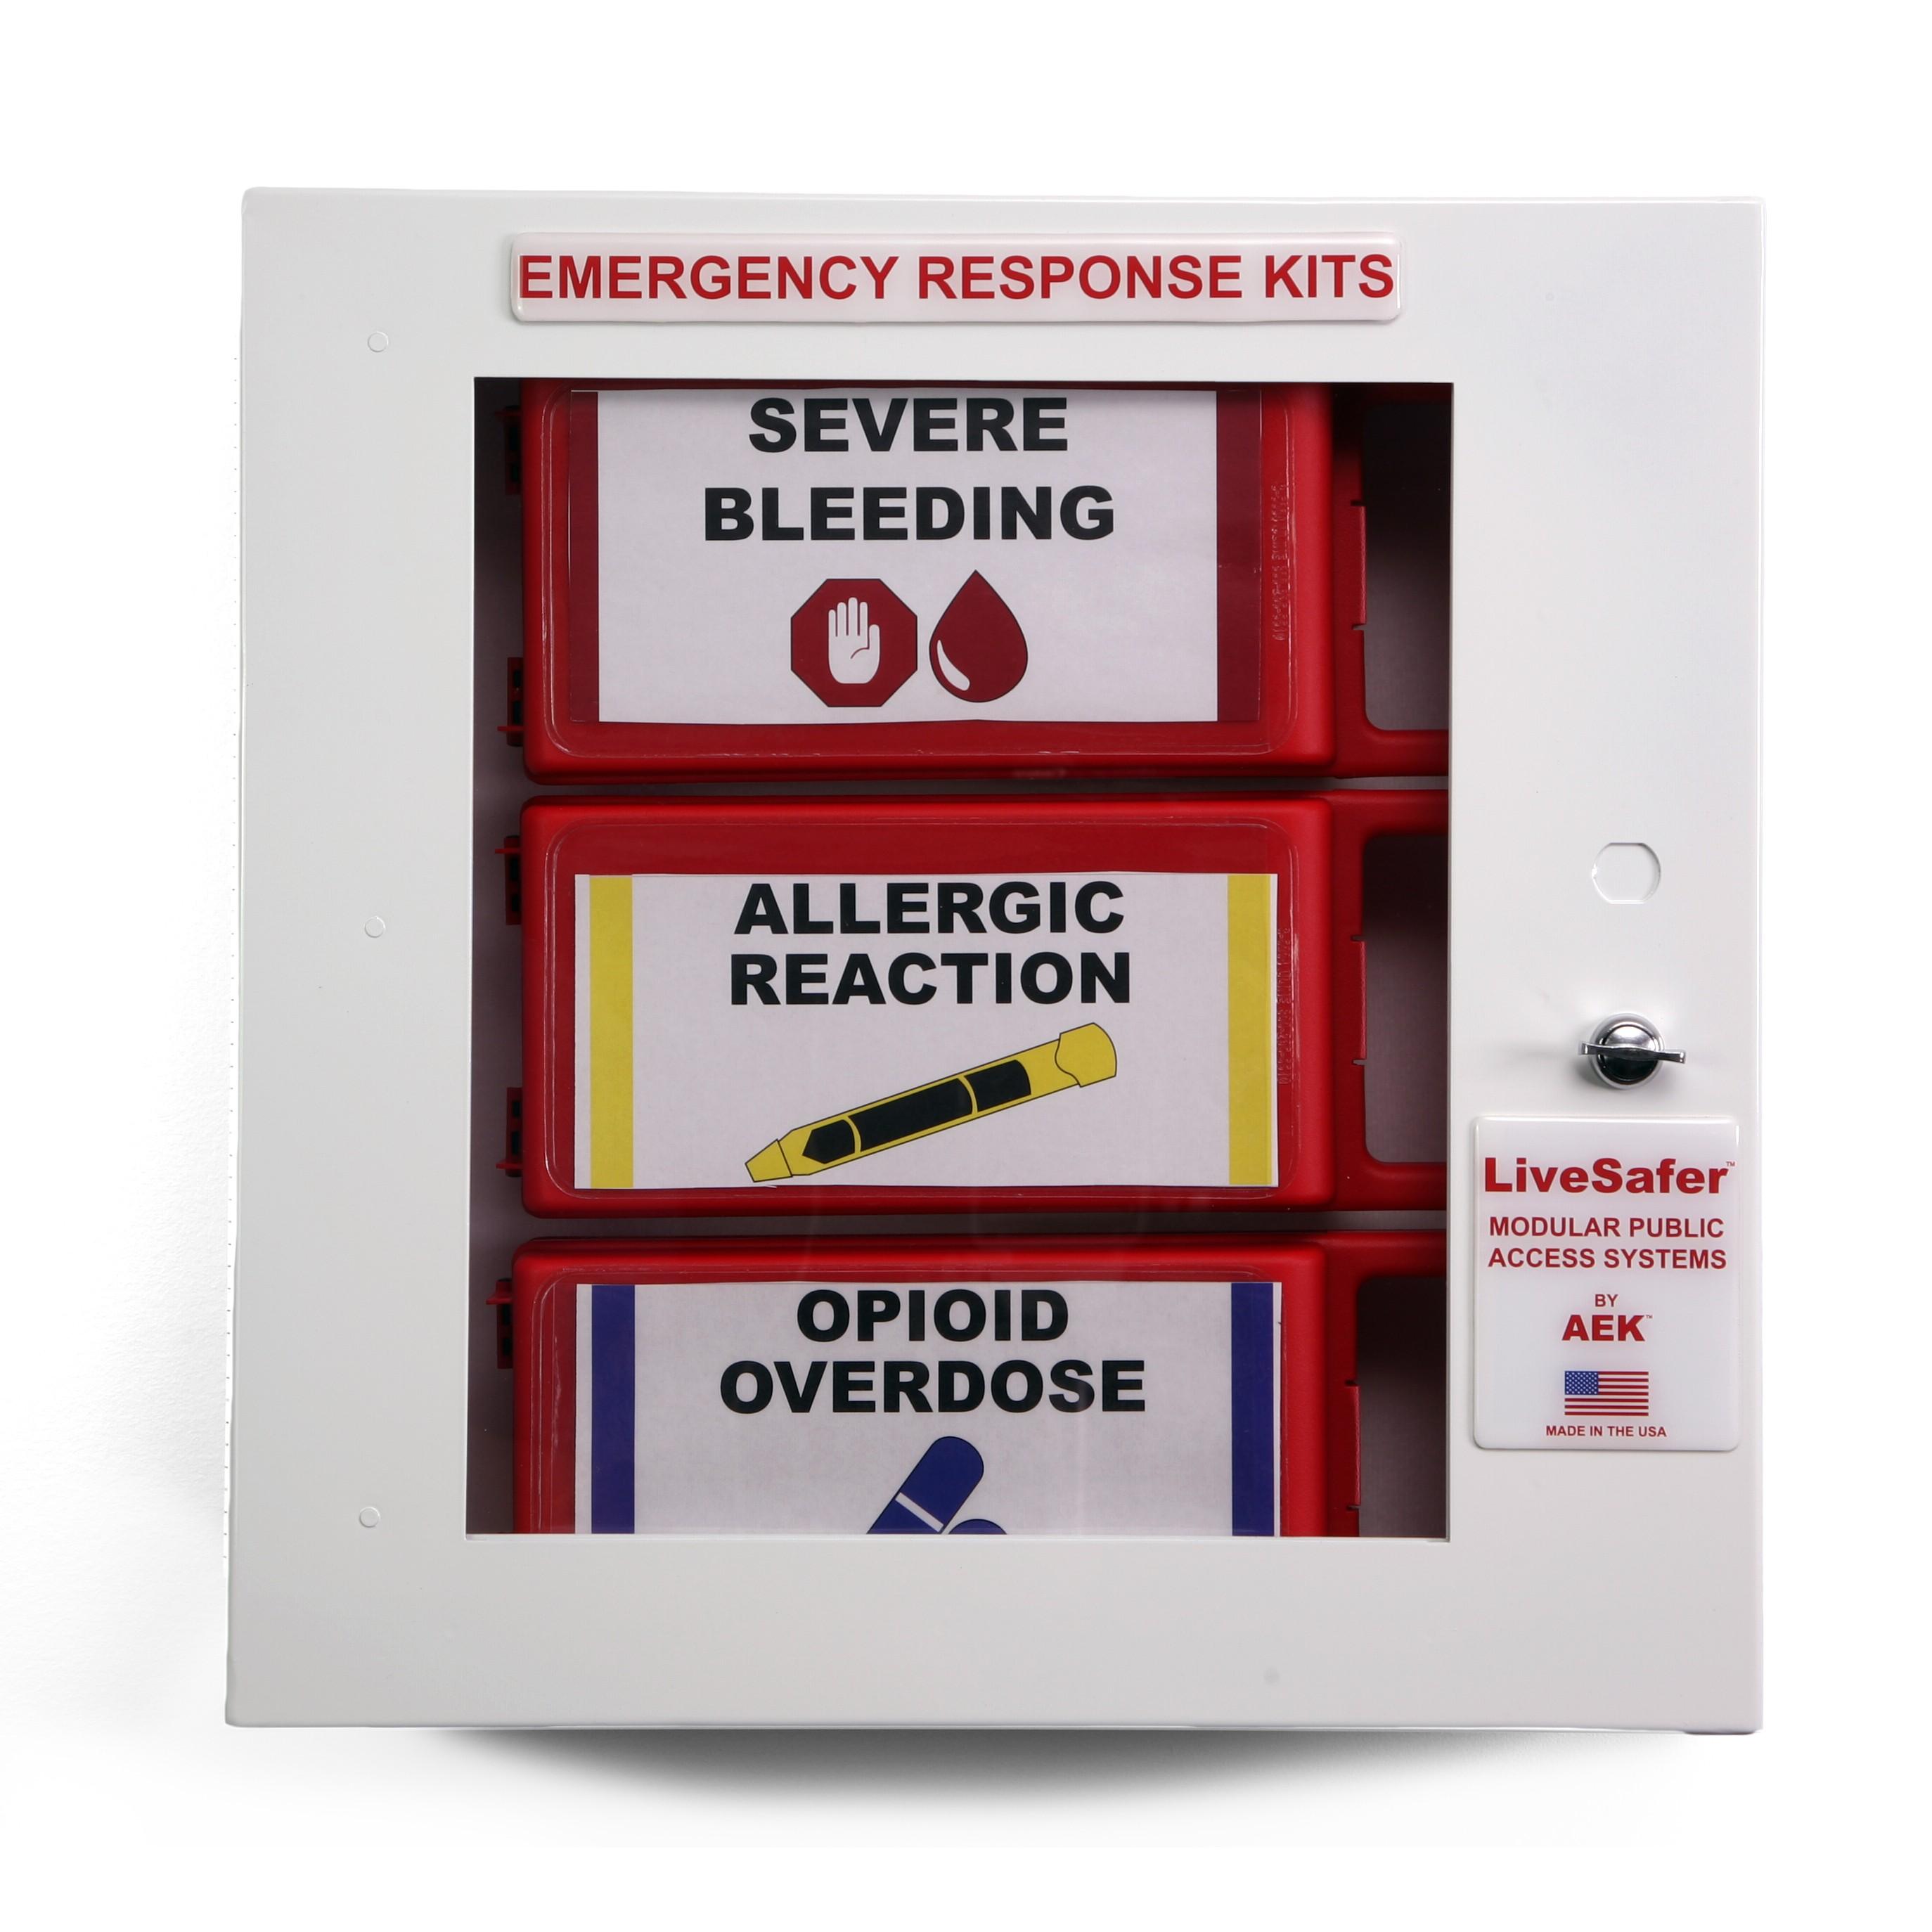 LiveSafer Modular Public Access First Aid System